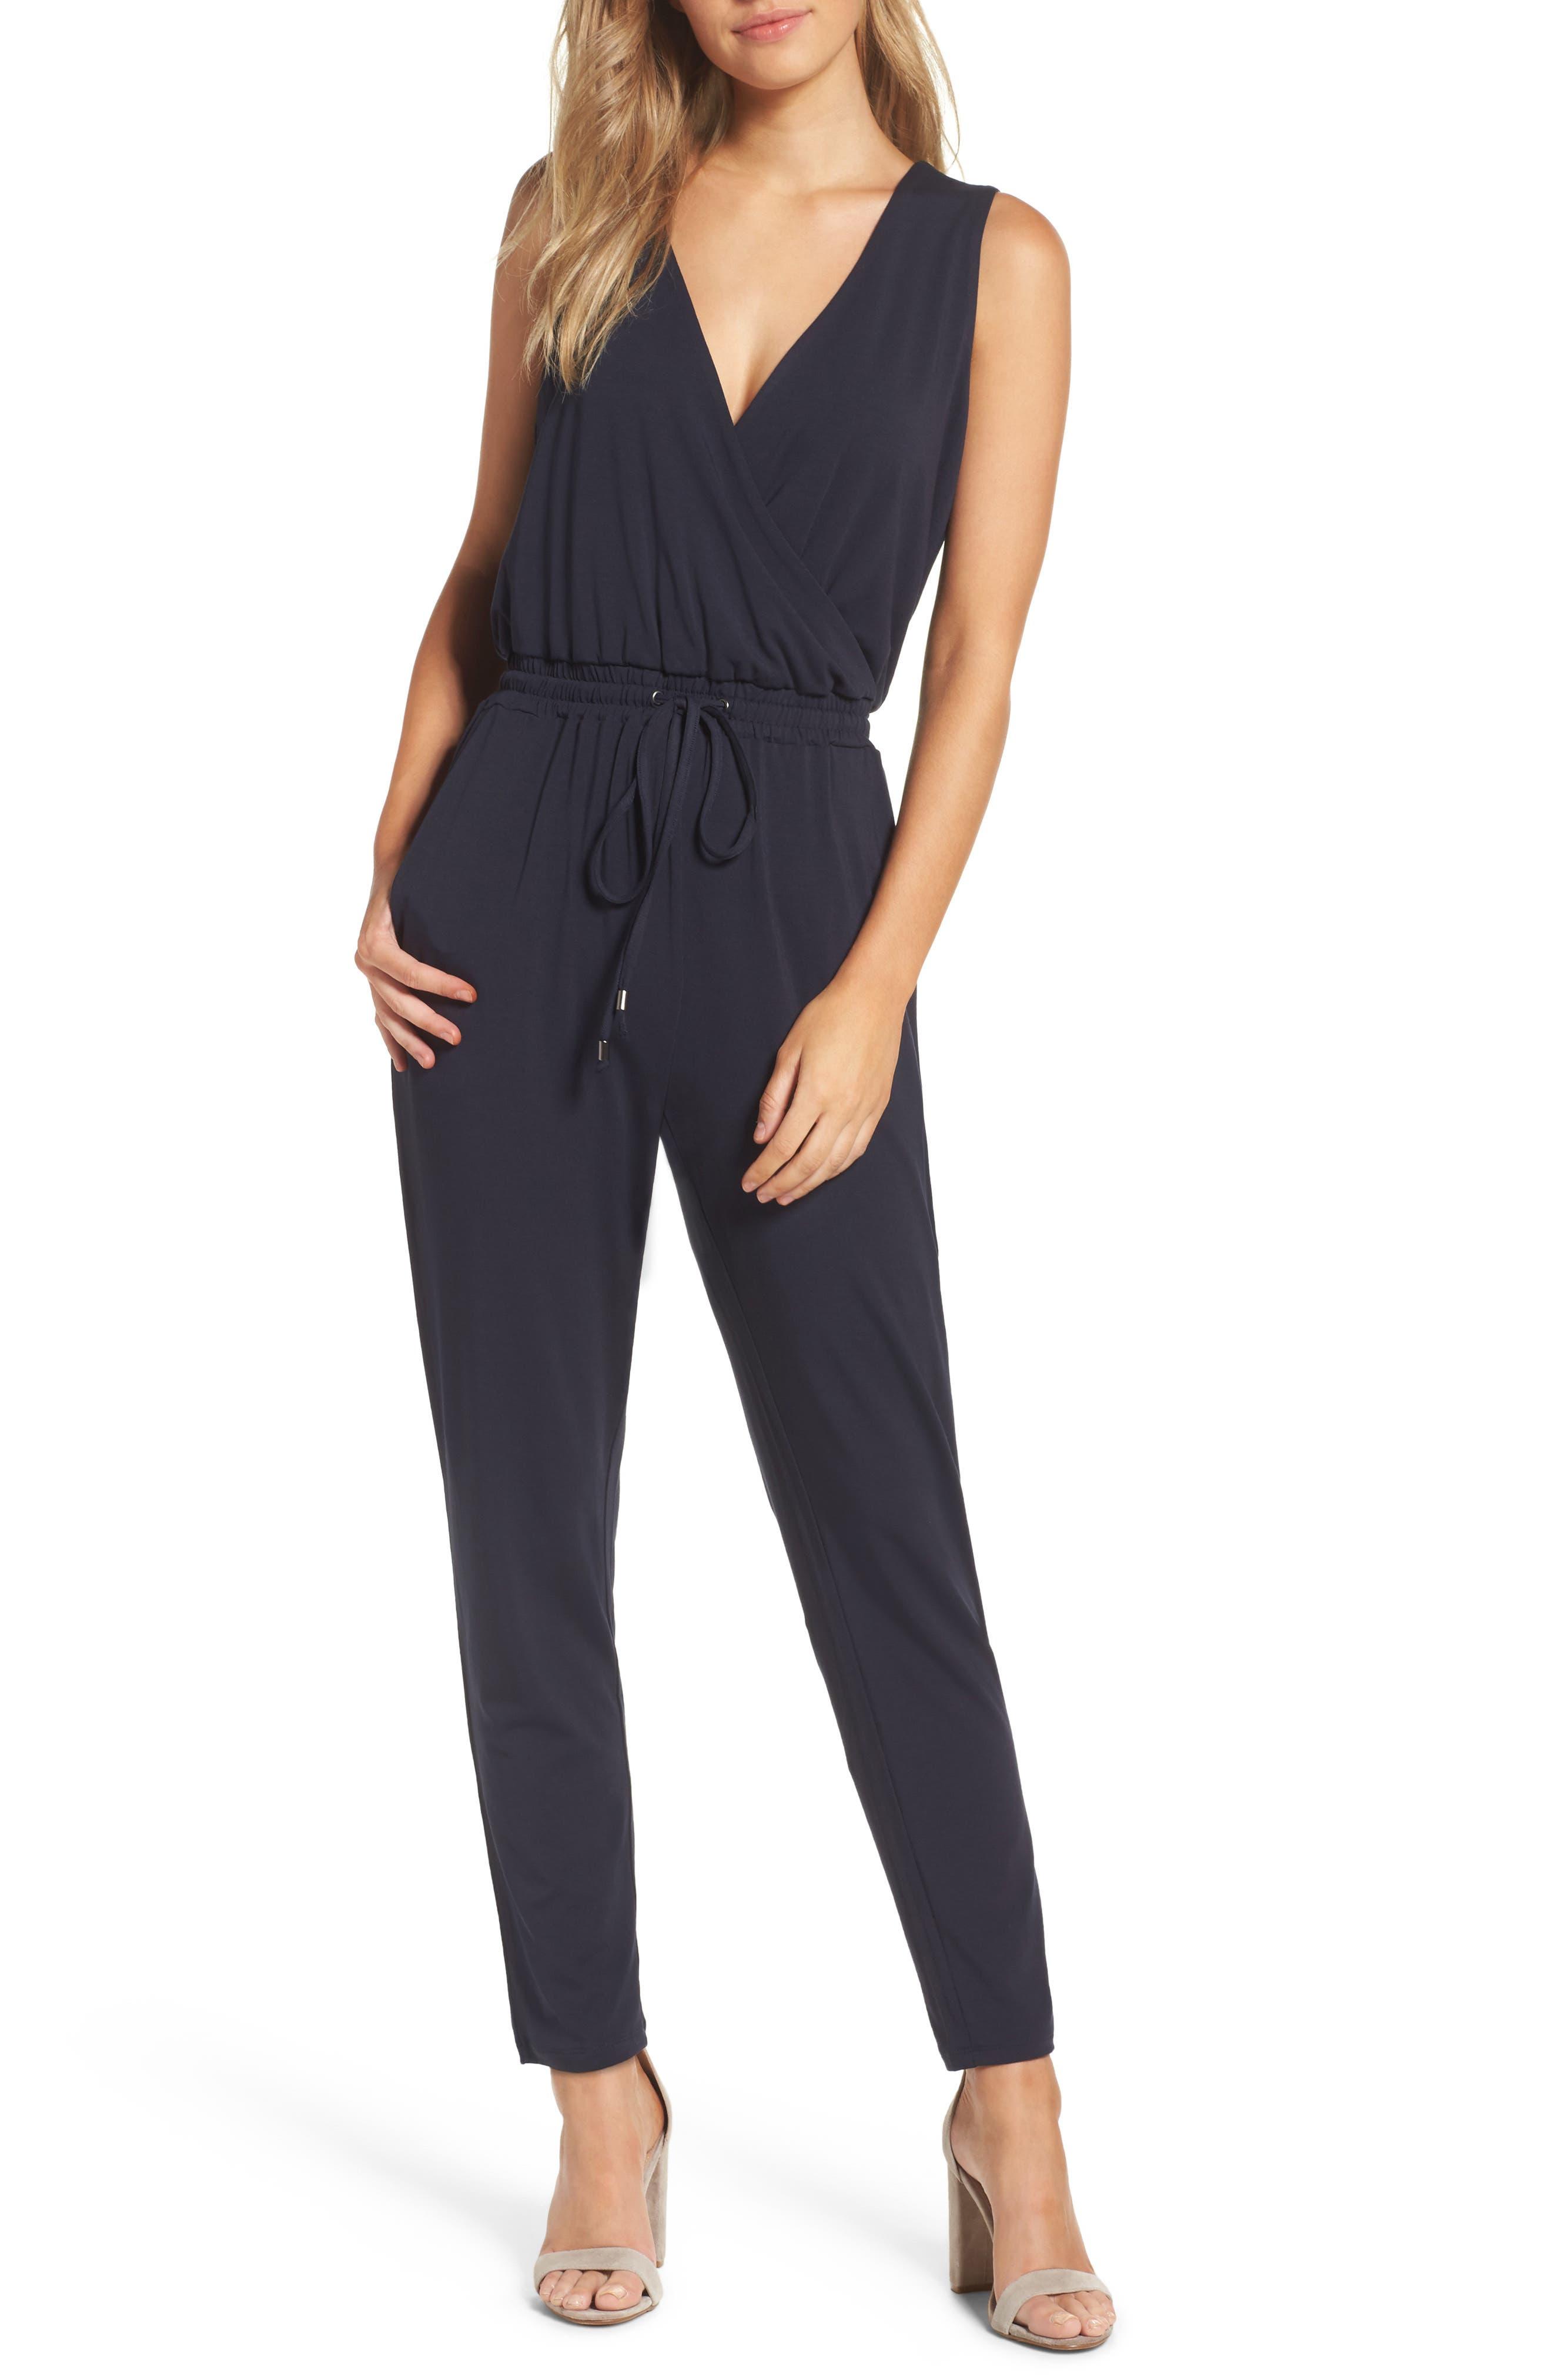 Felicity & Coco Jersey Jumpsuit (Nordstrom Exclusive)